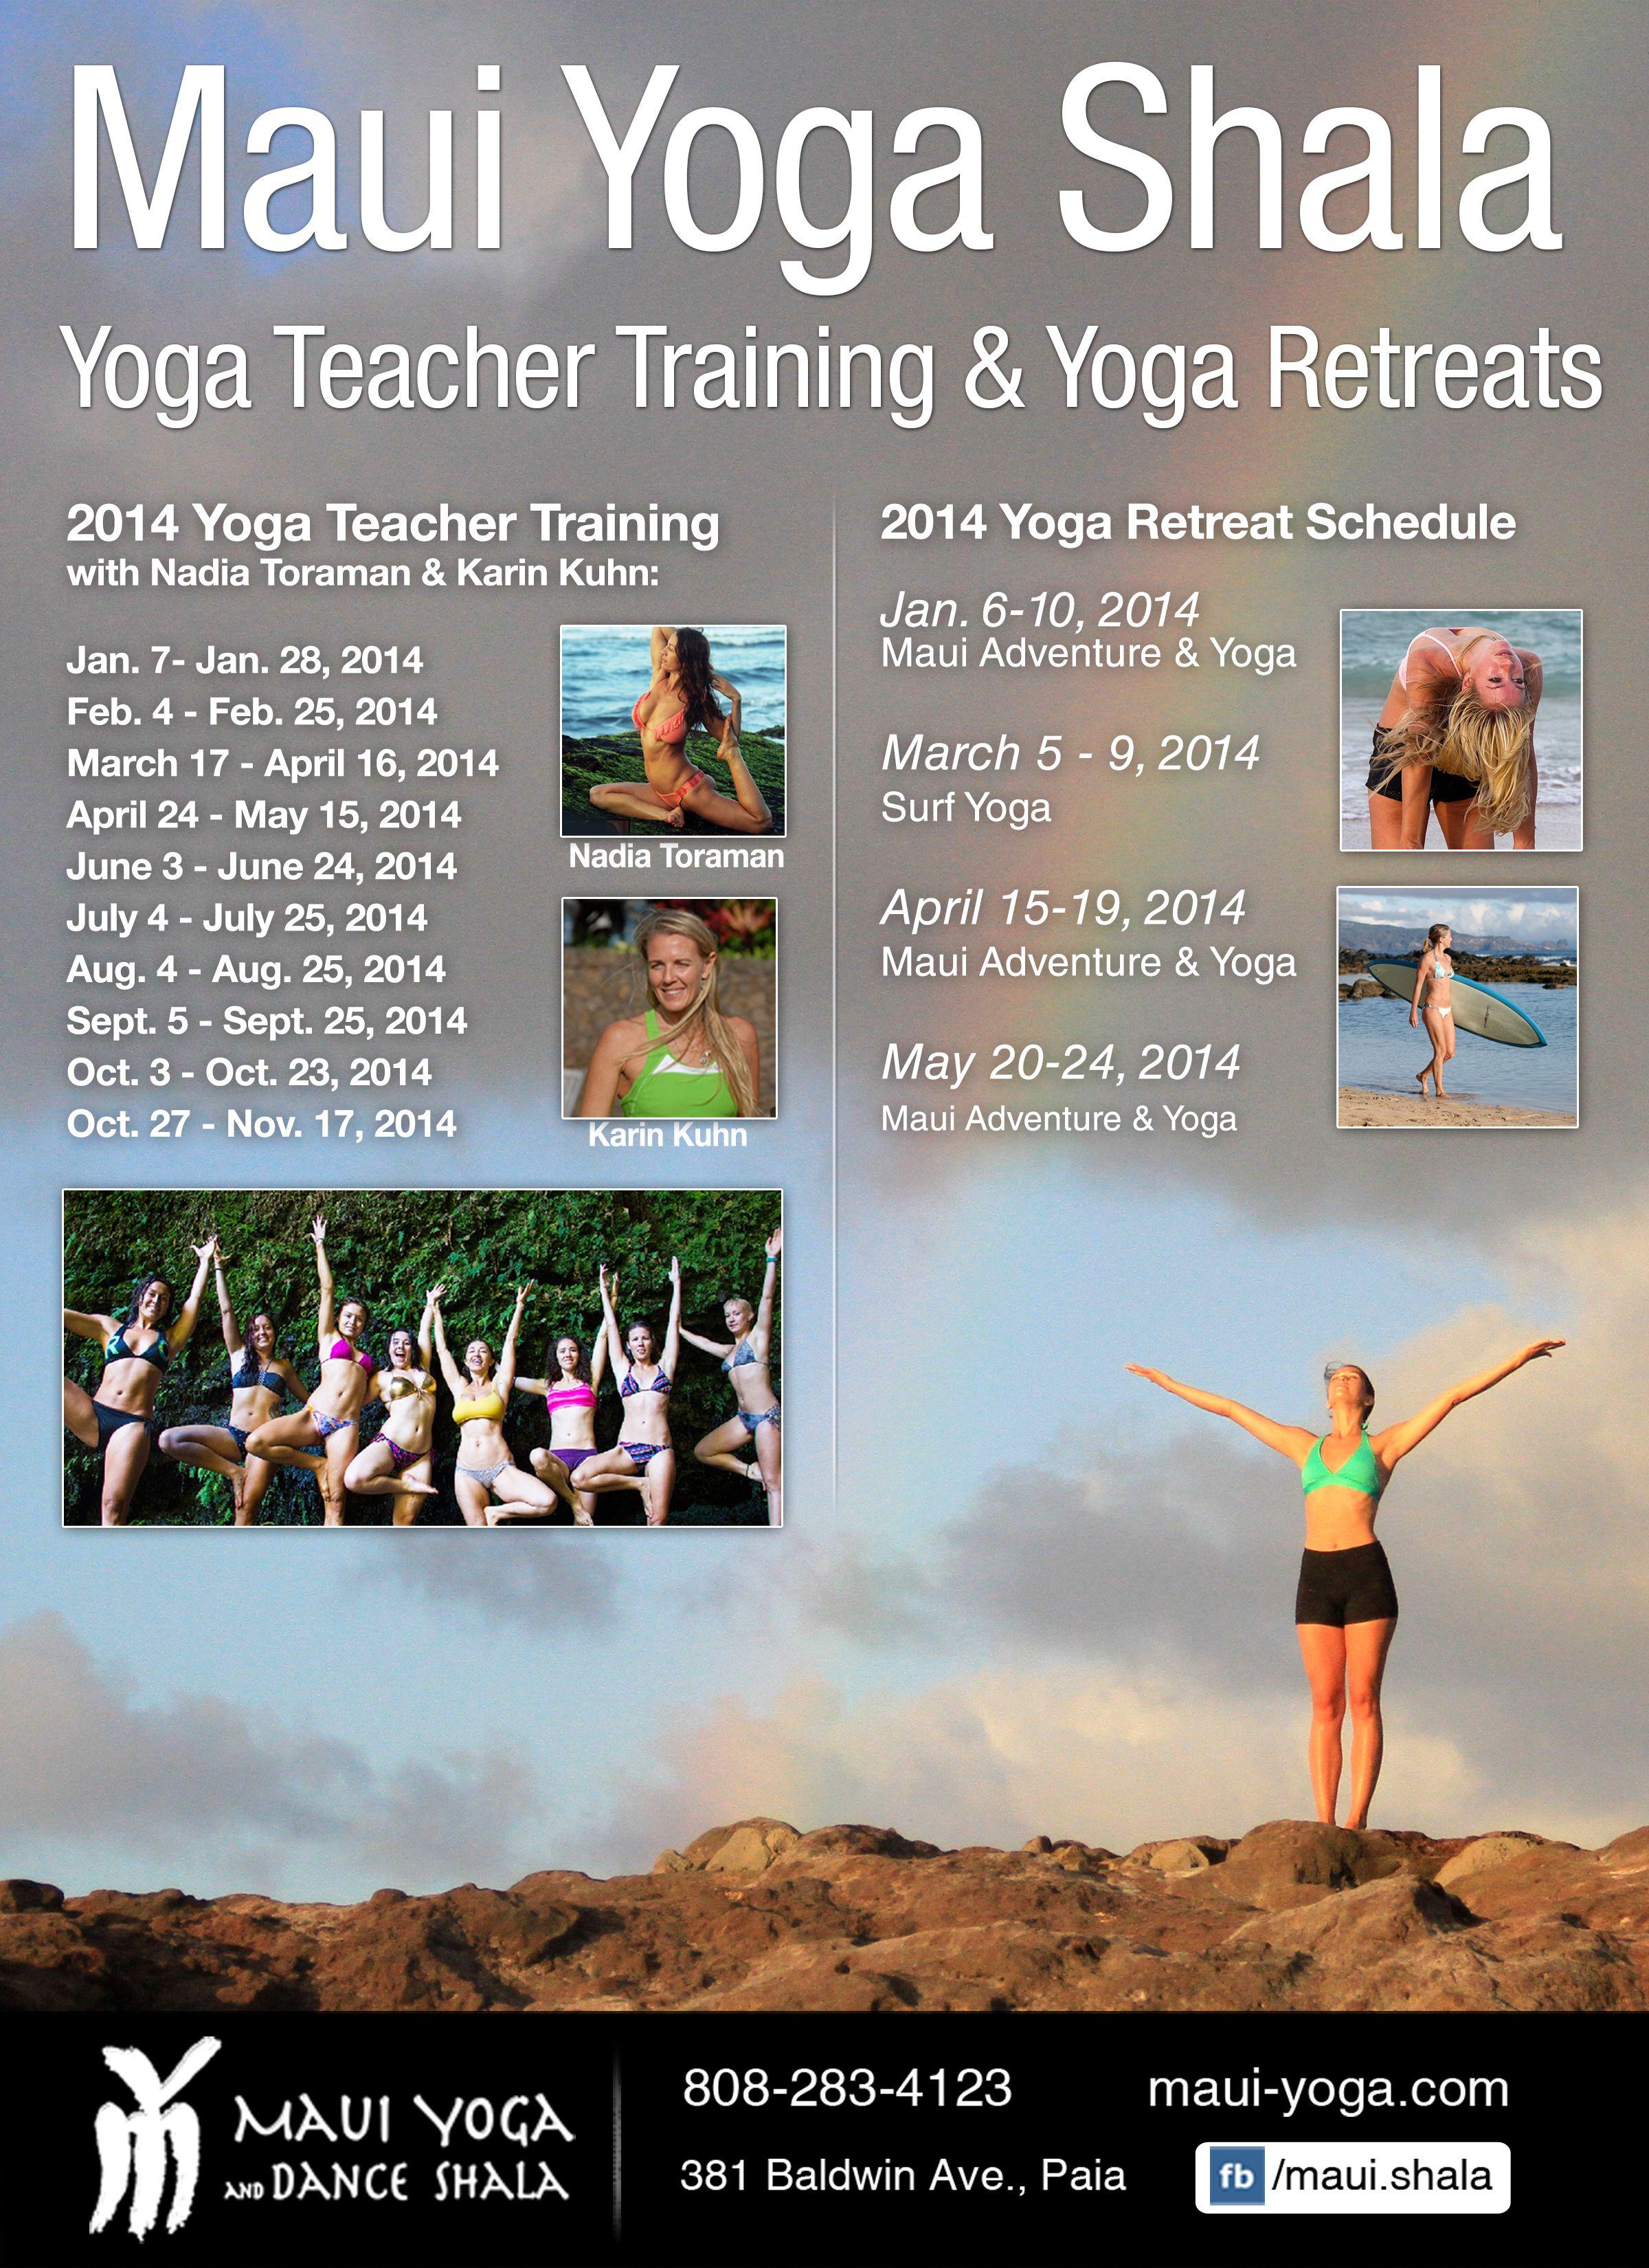 Yoga Teacher Training Yoga Retreats In Maui Hawaii Yoga Teacher Training Yoga Practice Inspiration Teacher Training